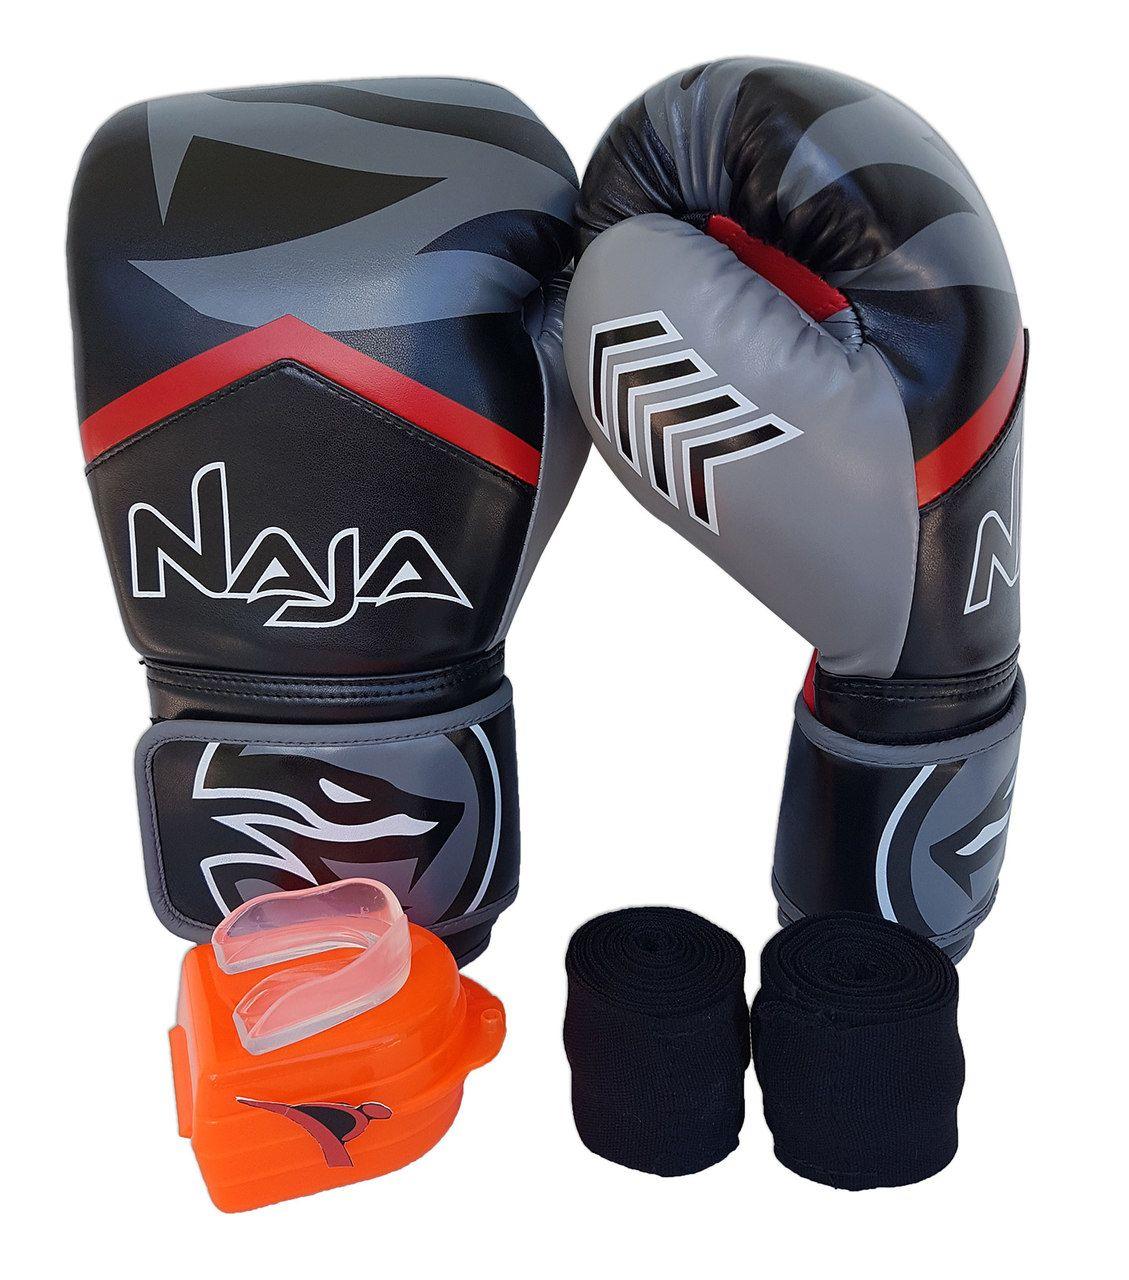 Kit De Boxe / Muay Thai 14oz - Preto - New Extreme - Naja  - PRALUTA SHOP